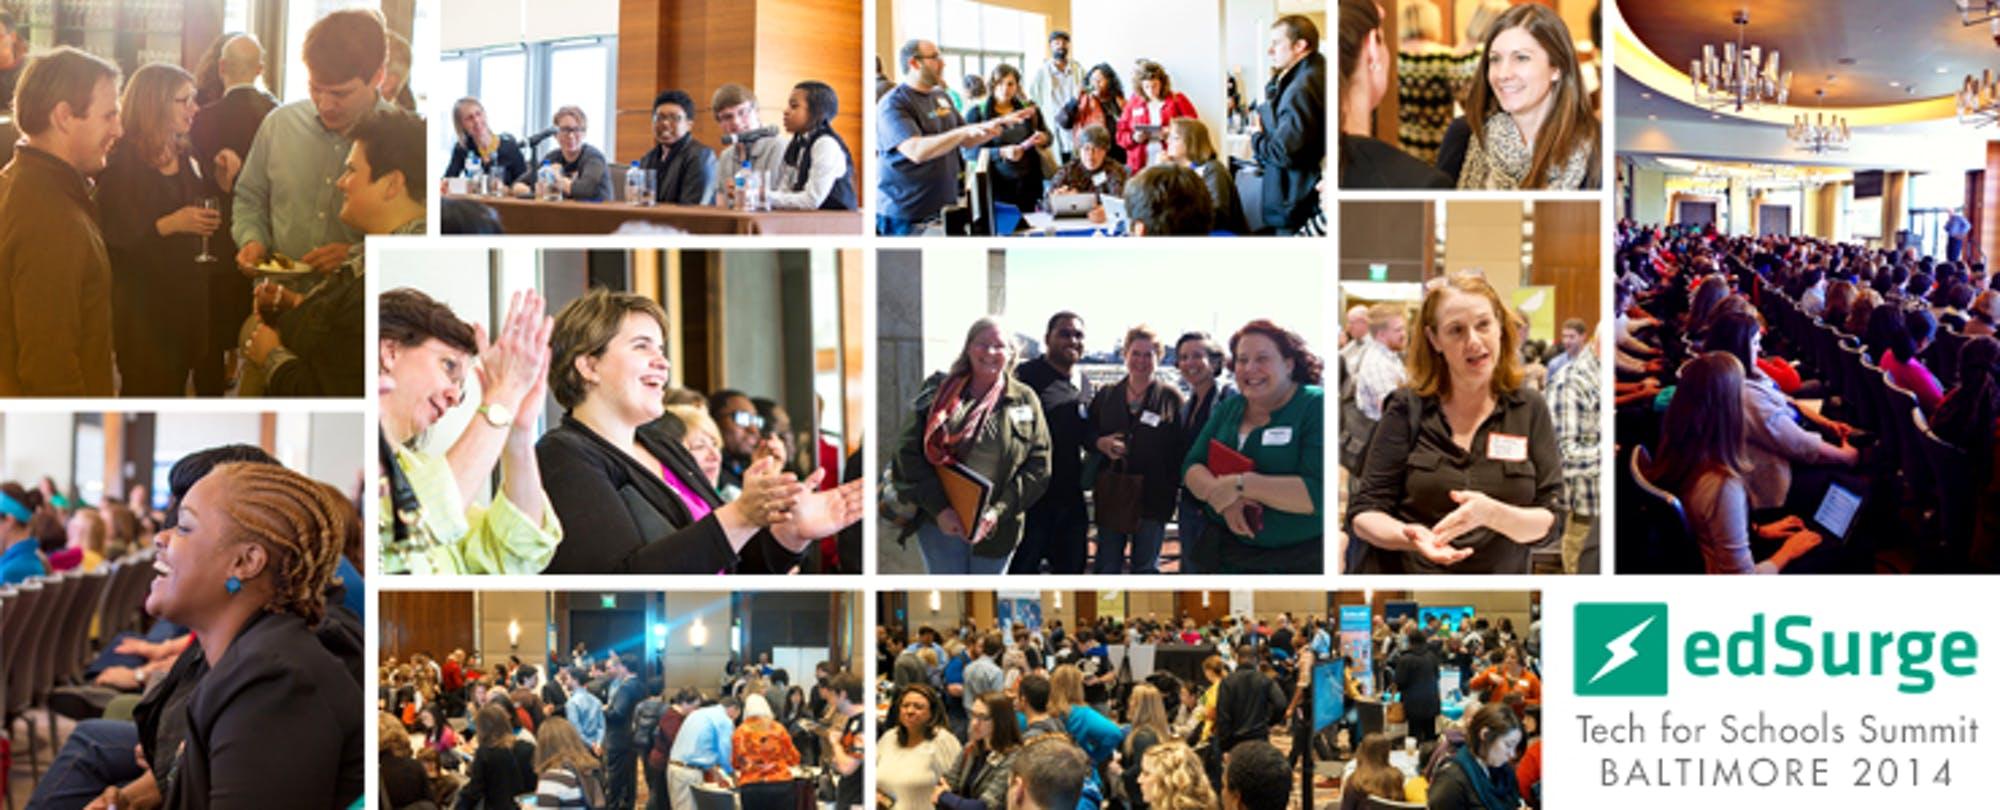 Baltimore Rocks the EdSurge Tech For Schools Summit